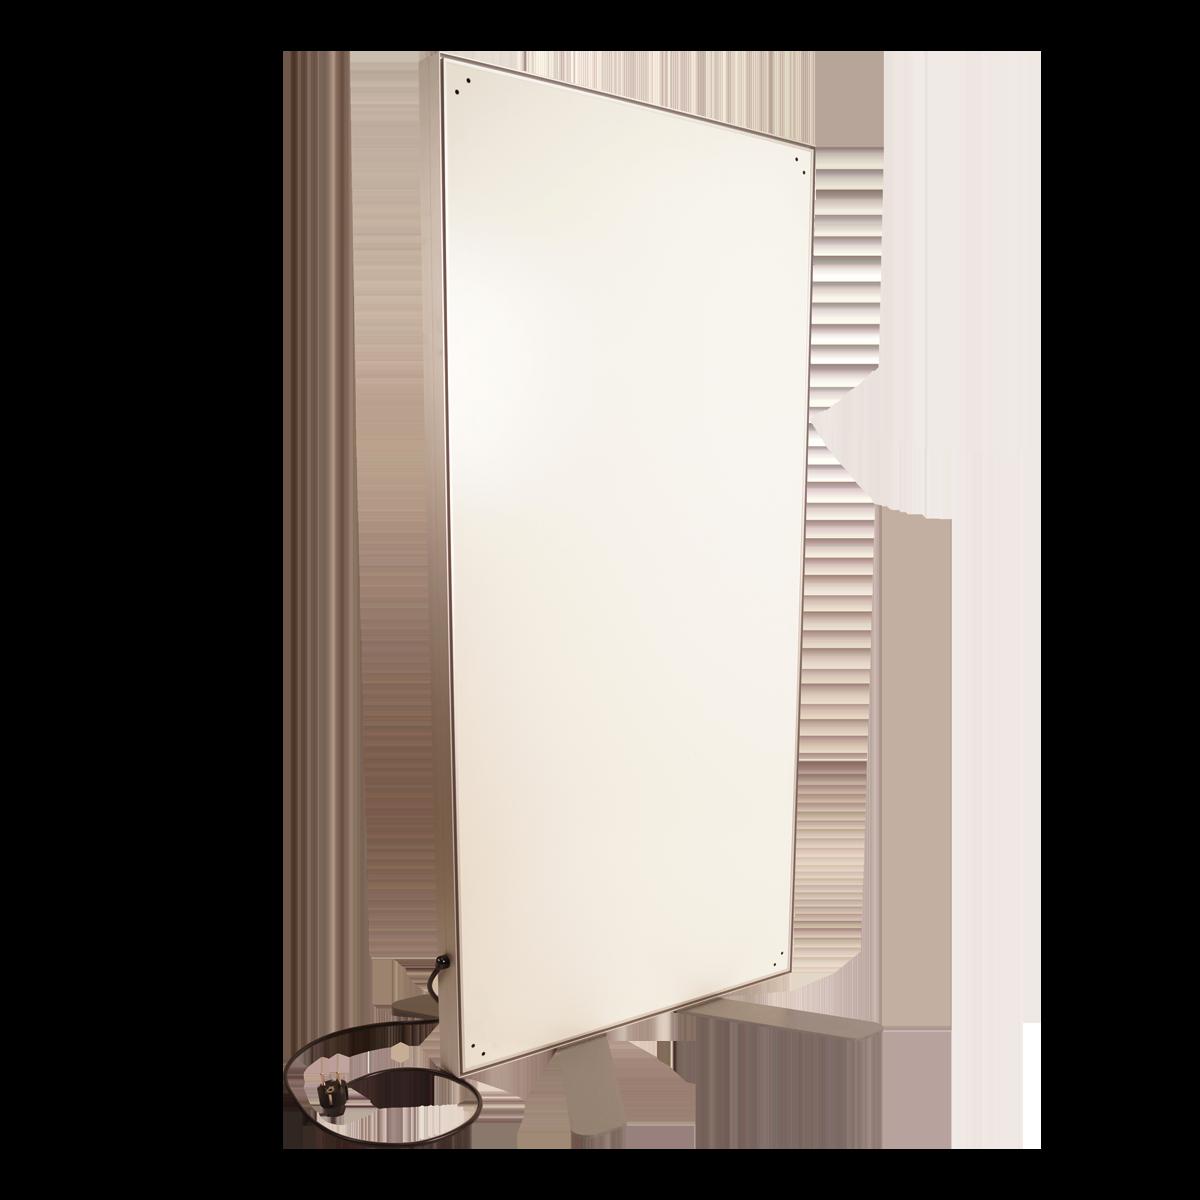 heatfun l alu mobiel verticaal heatfun infraroodverwarming